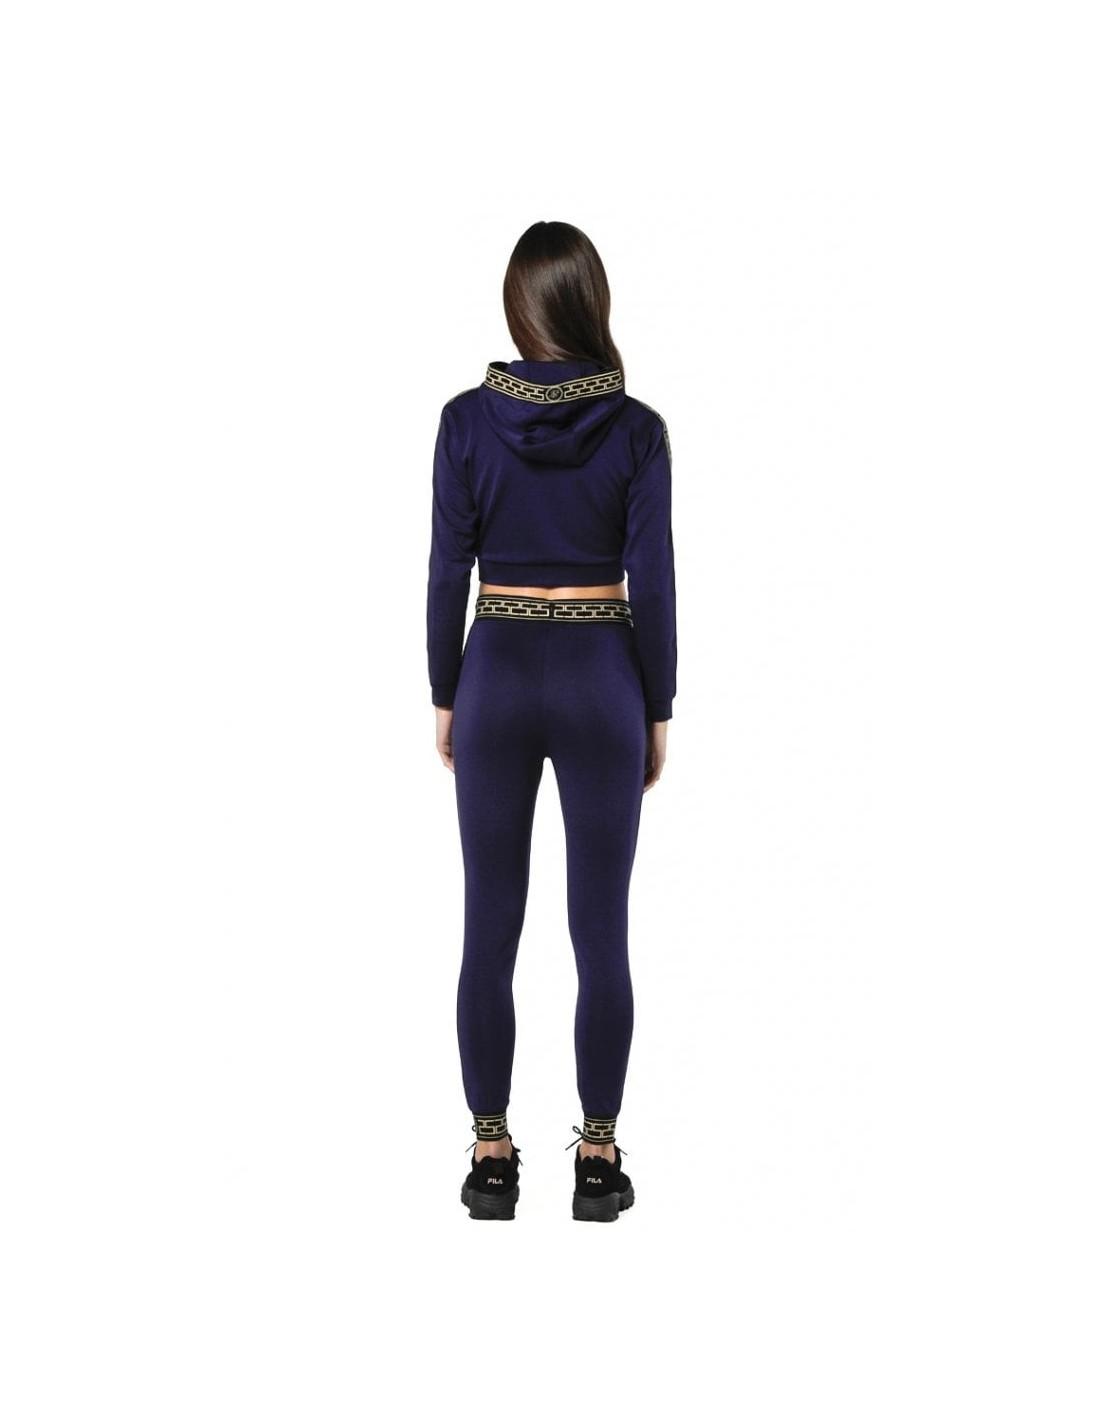 Jeans Short SikSilk Distressed Skinny Black